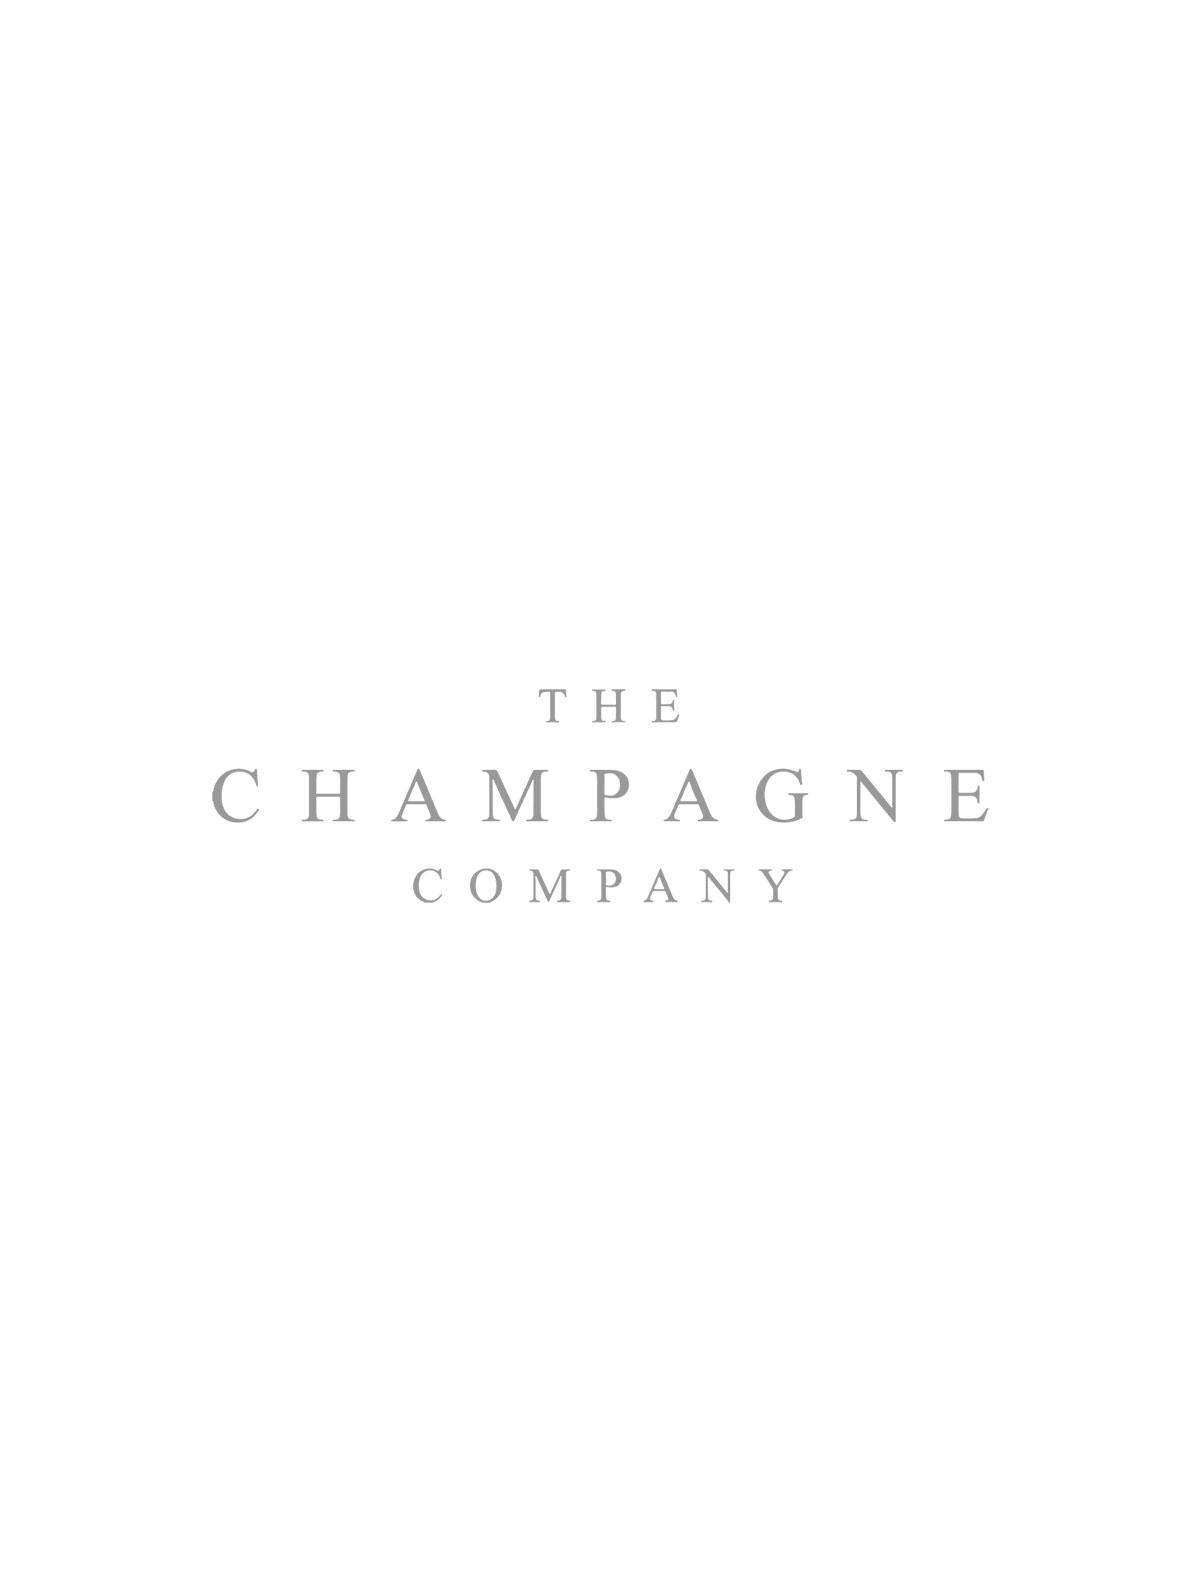 Fleur du Cap Pinotage Berkelder Selection 2009 South Africa Red Wine